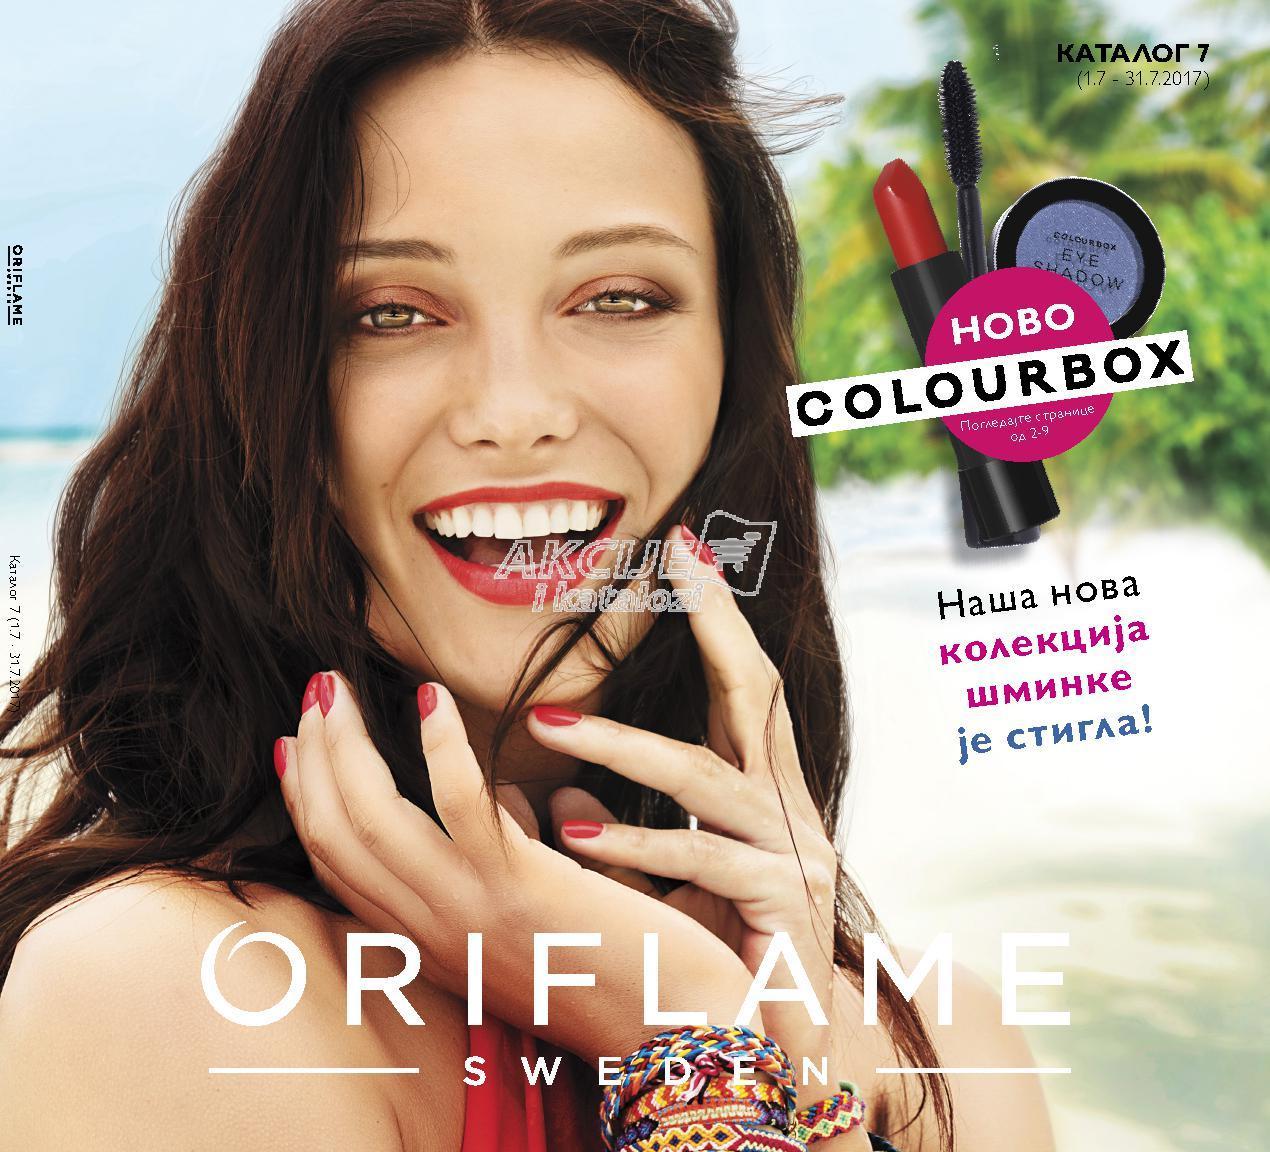 Oriflame - Redovna akcija letnje kupovine